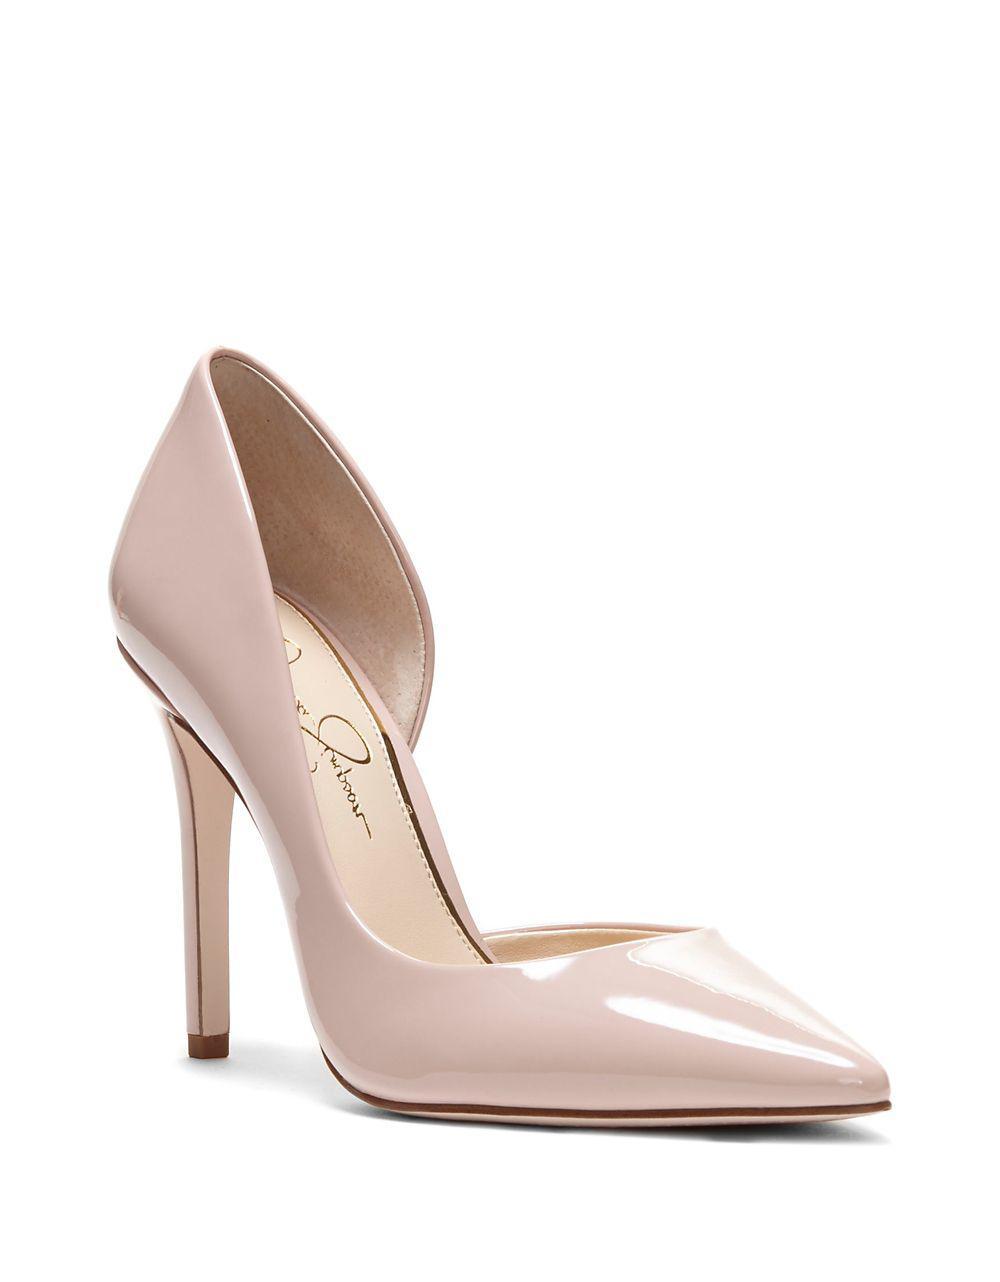 Jessica Simpson Pheona Pointed Toe Pump (Women's) UM3wH